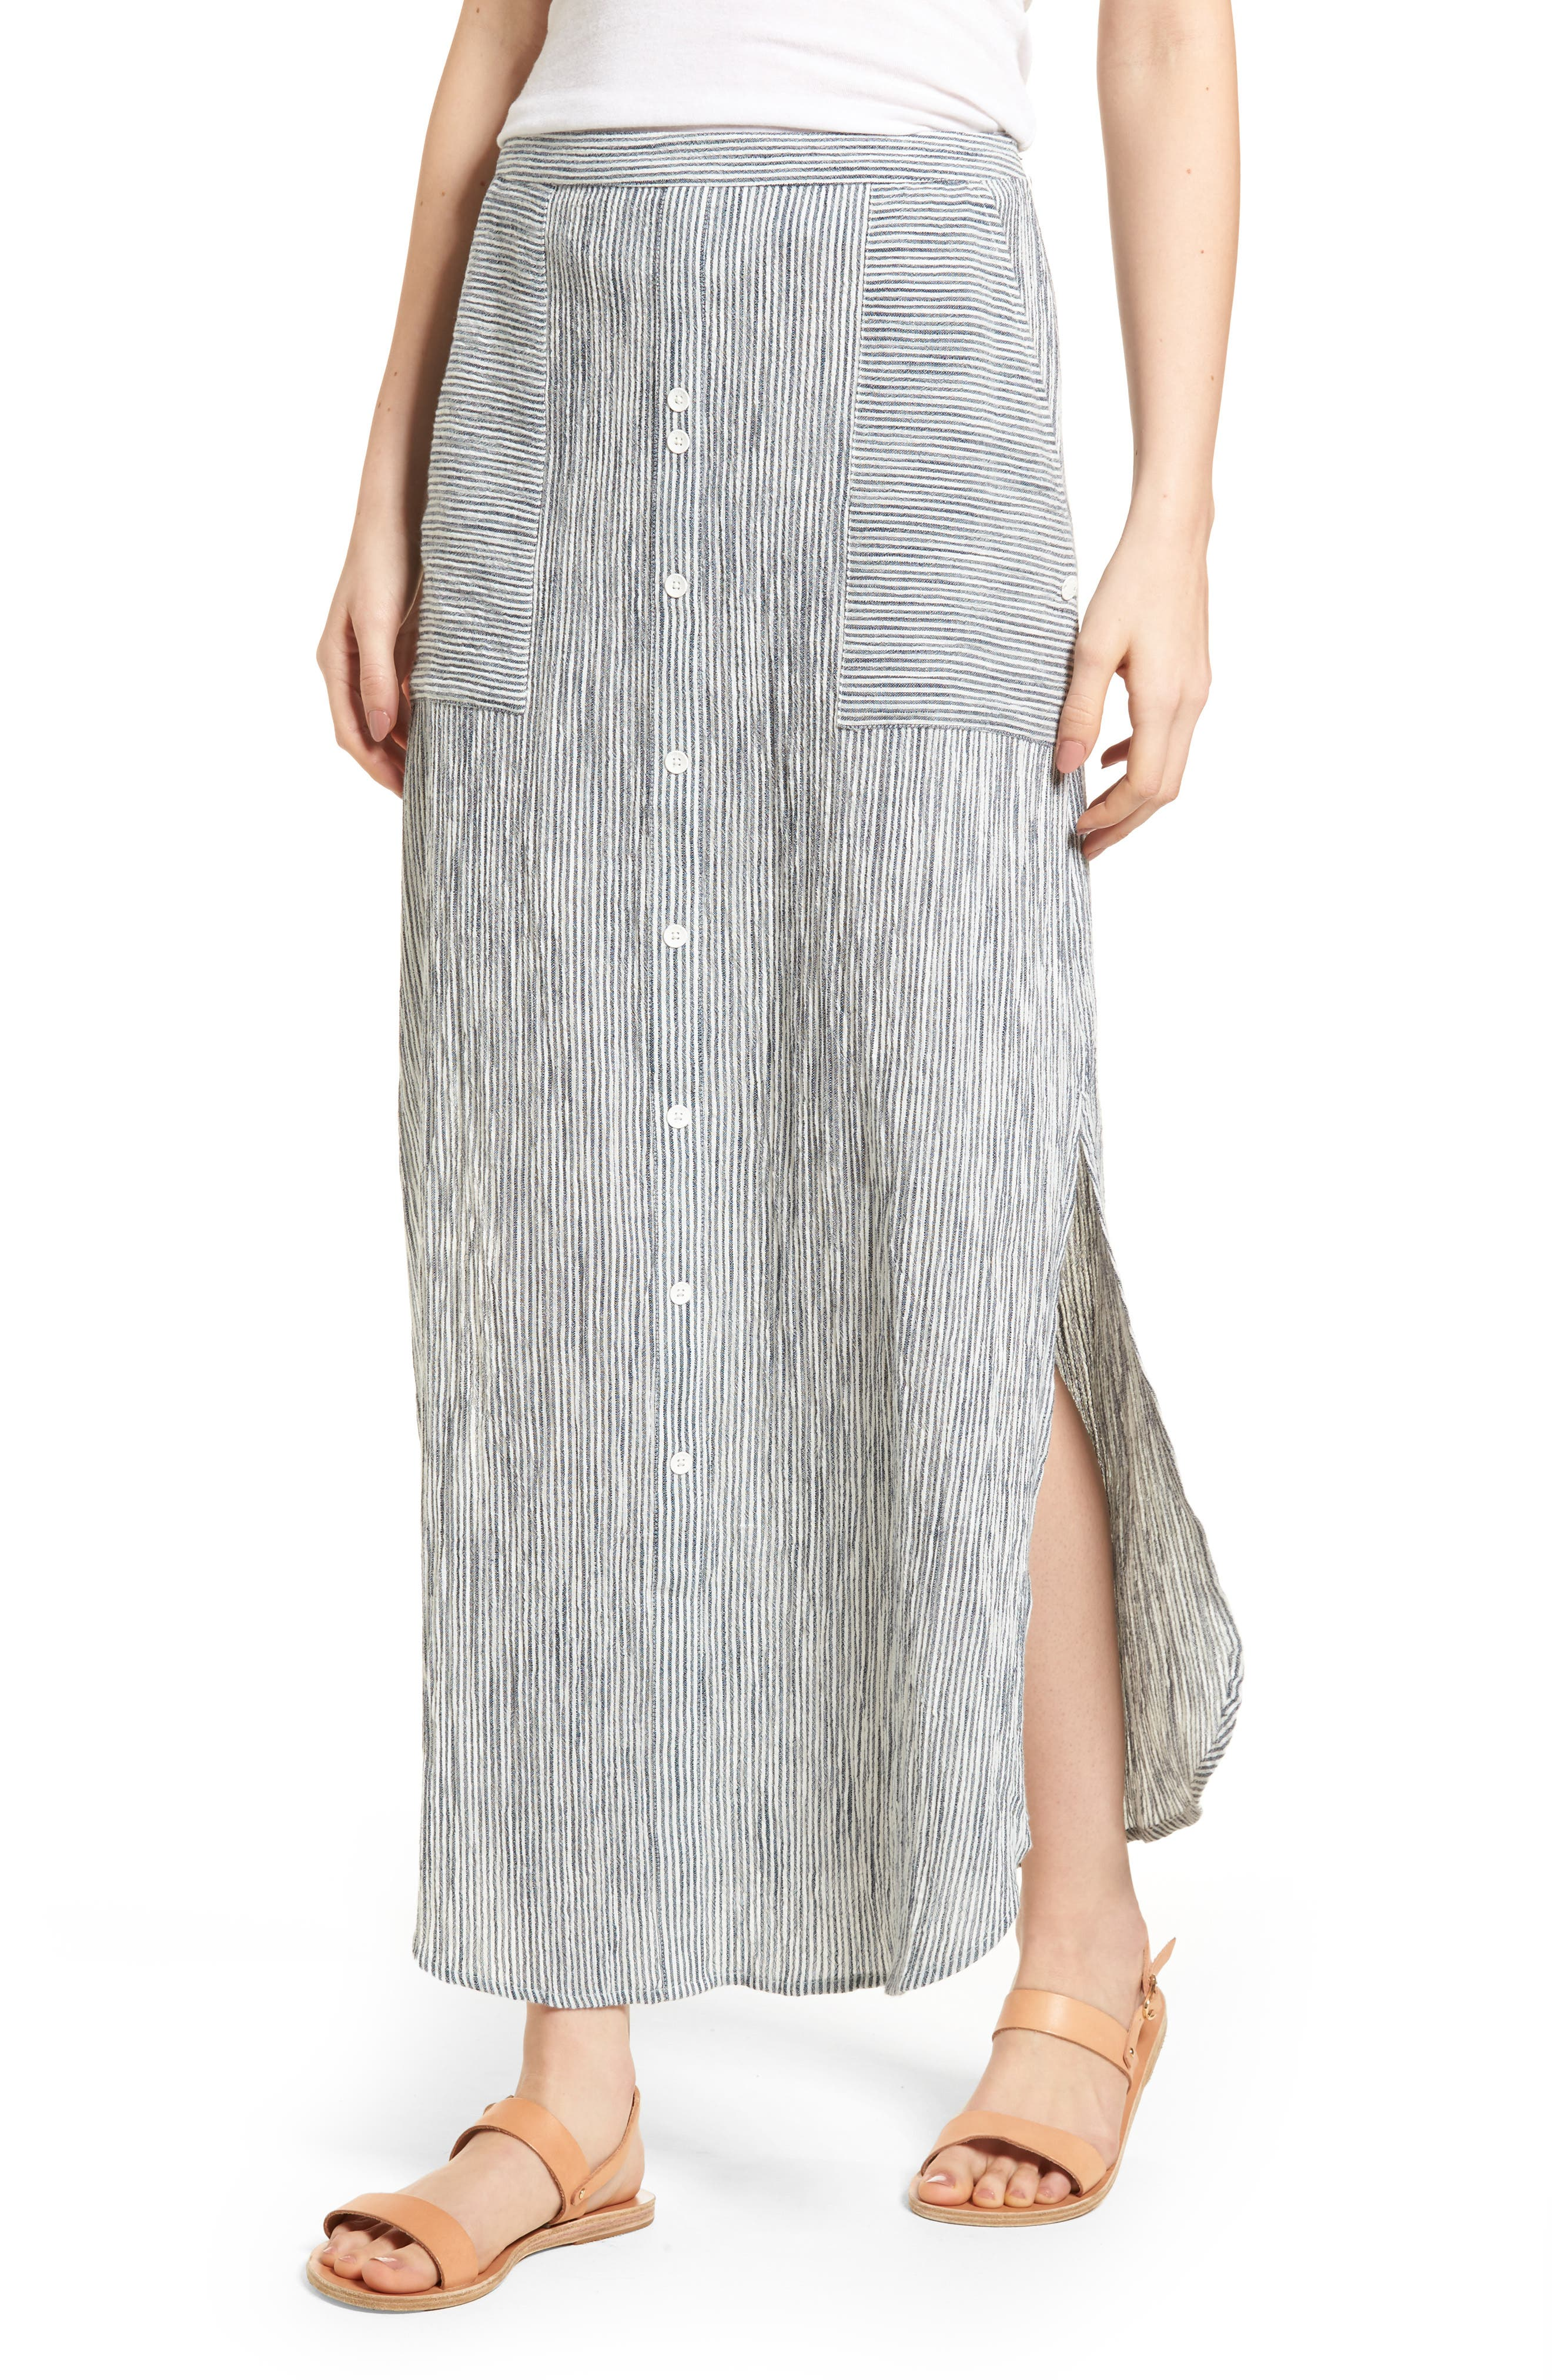 Sunset Islands Pinstripe Maxi Skirt,                             Main thumbnail 1, color,                             101